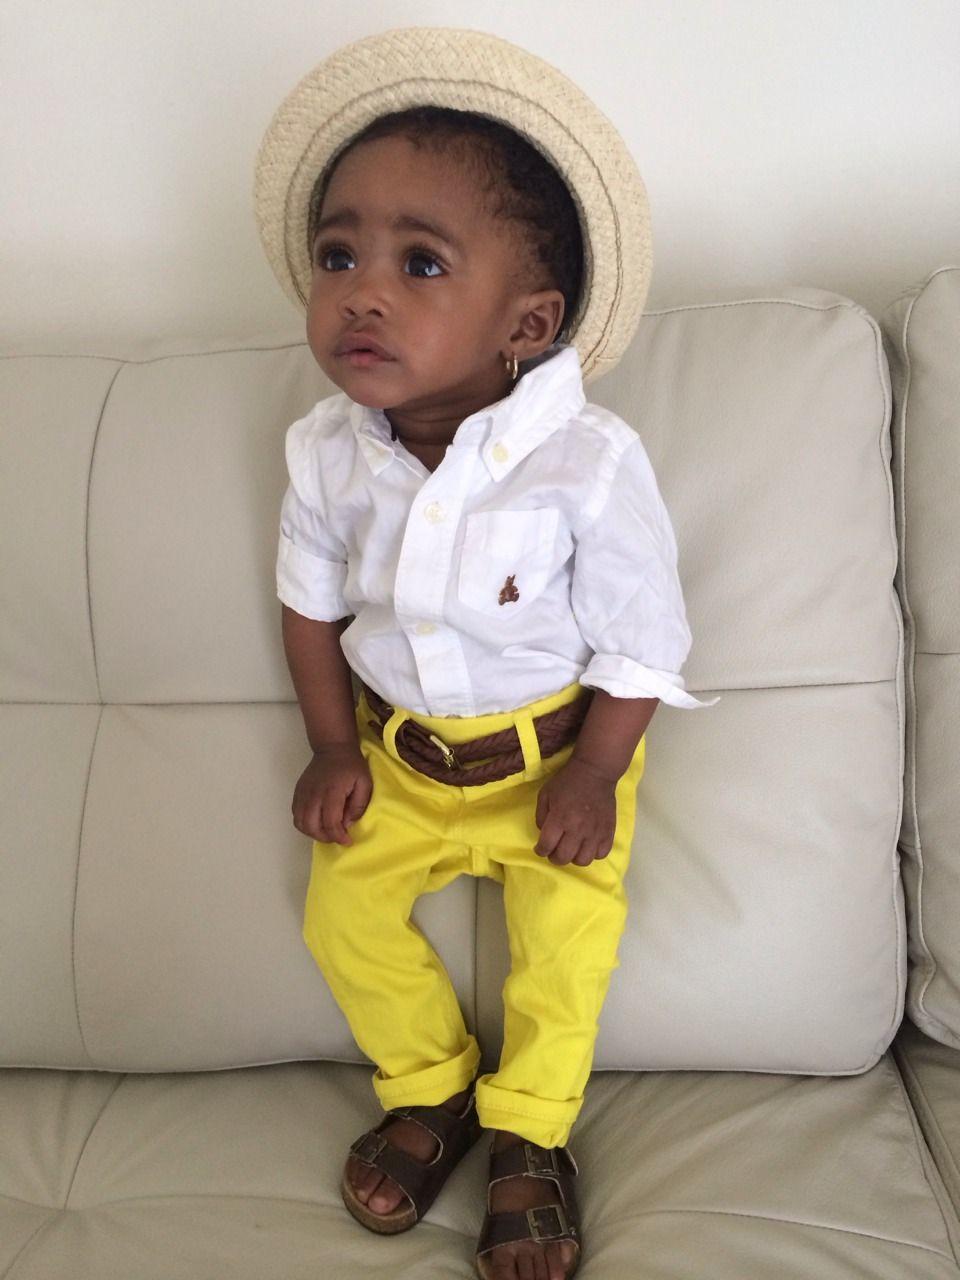 livewith-nolimit: yarrahs-life: jordieham: look at my niece tailore